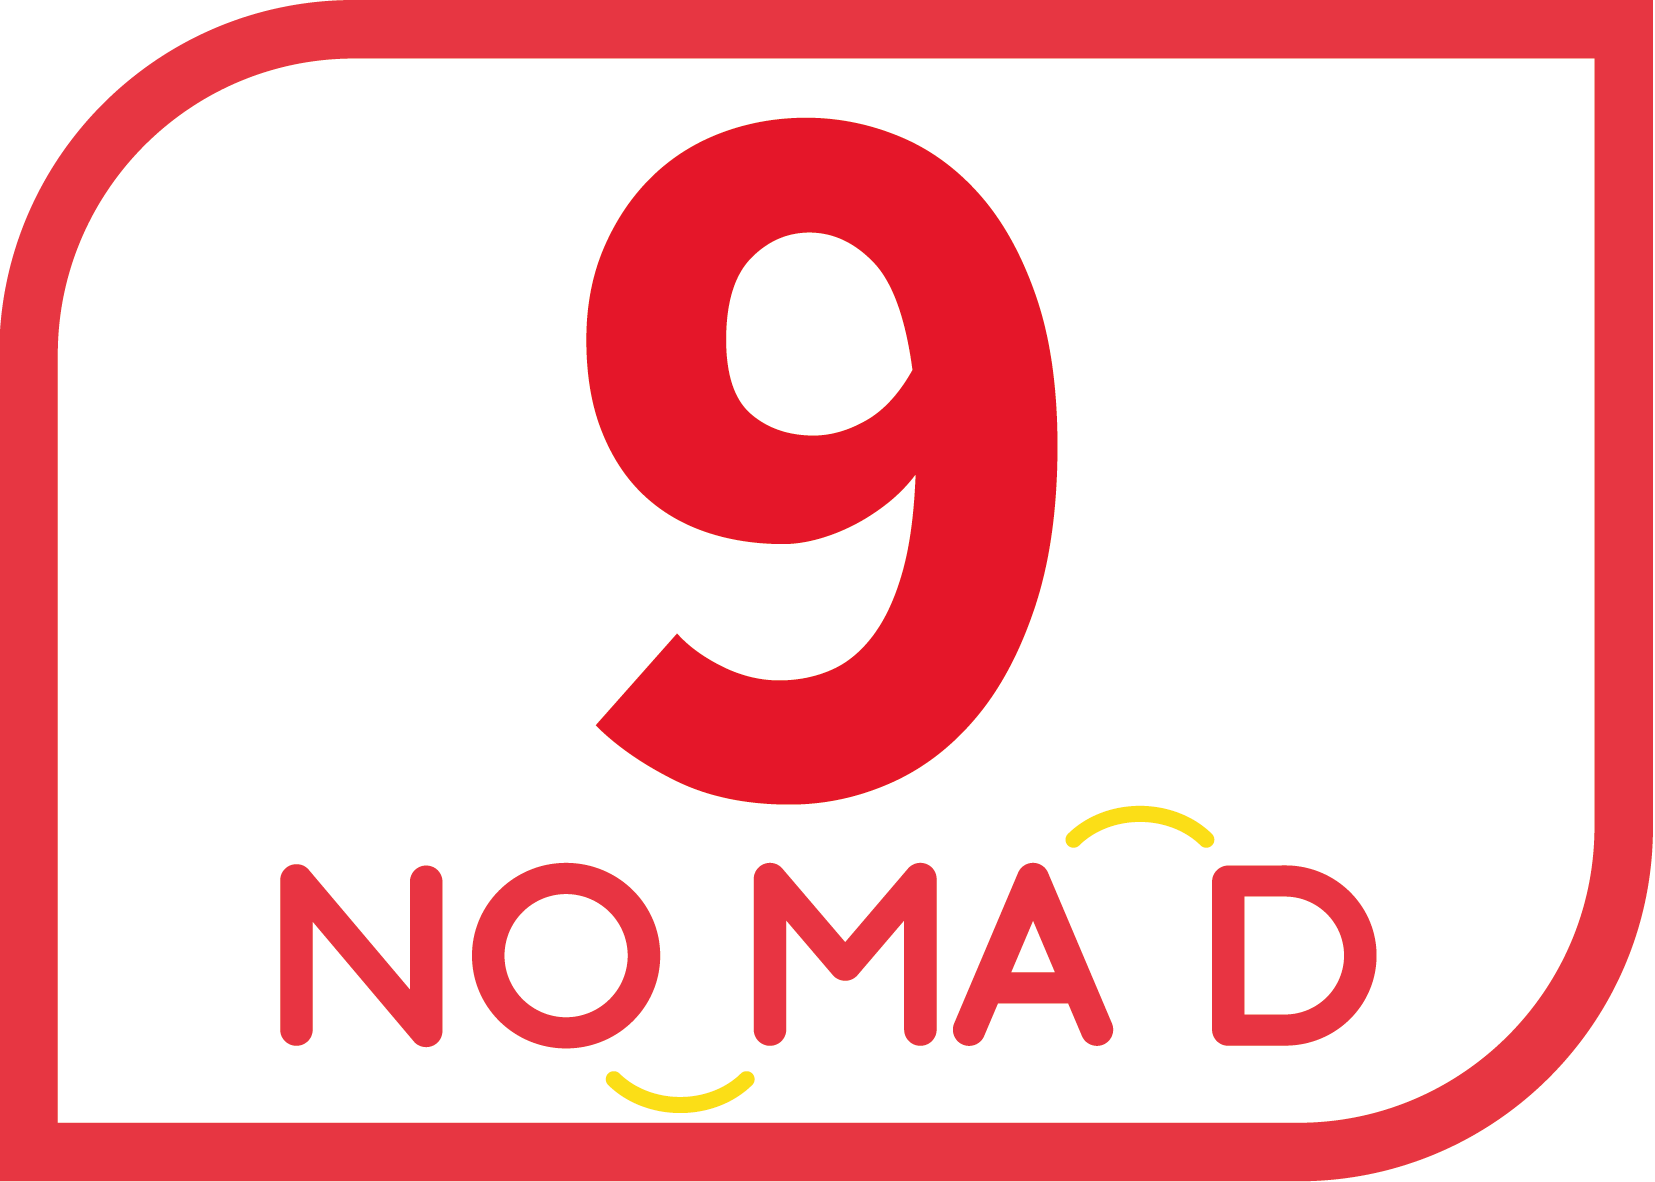 Nomad 9